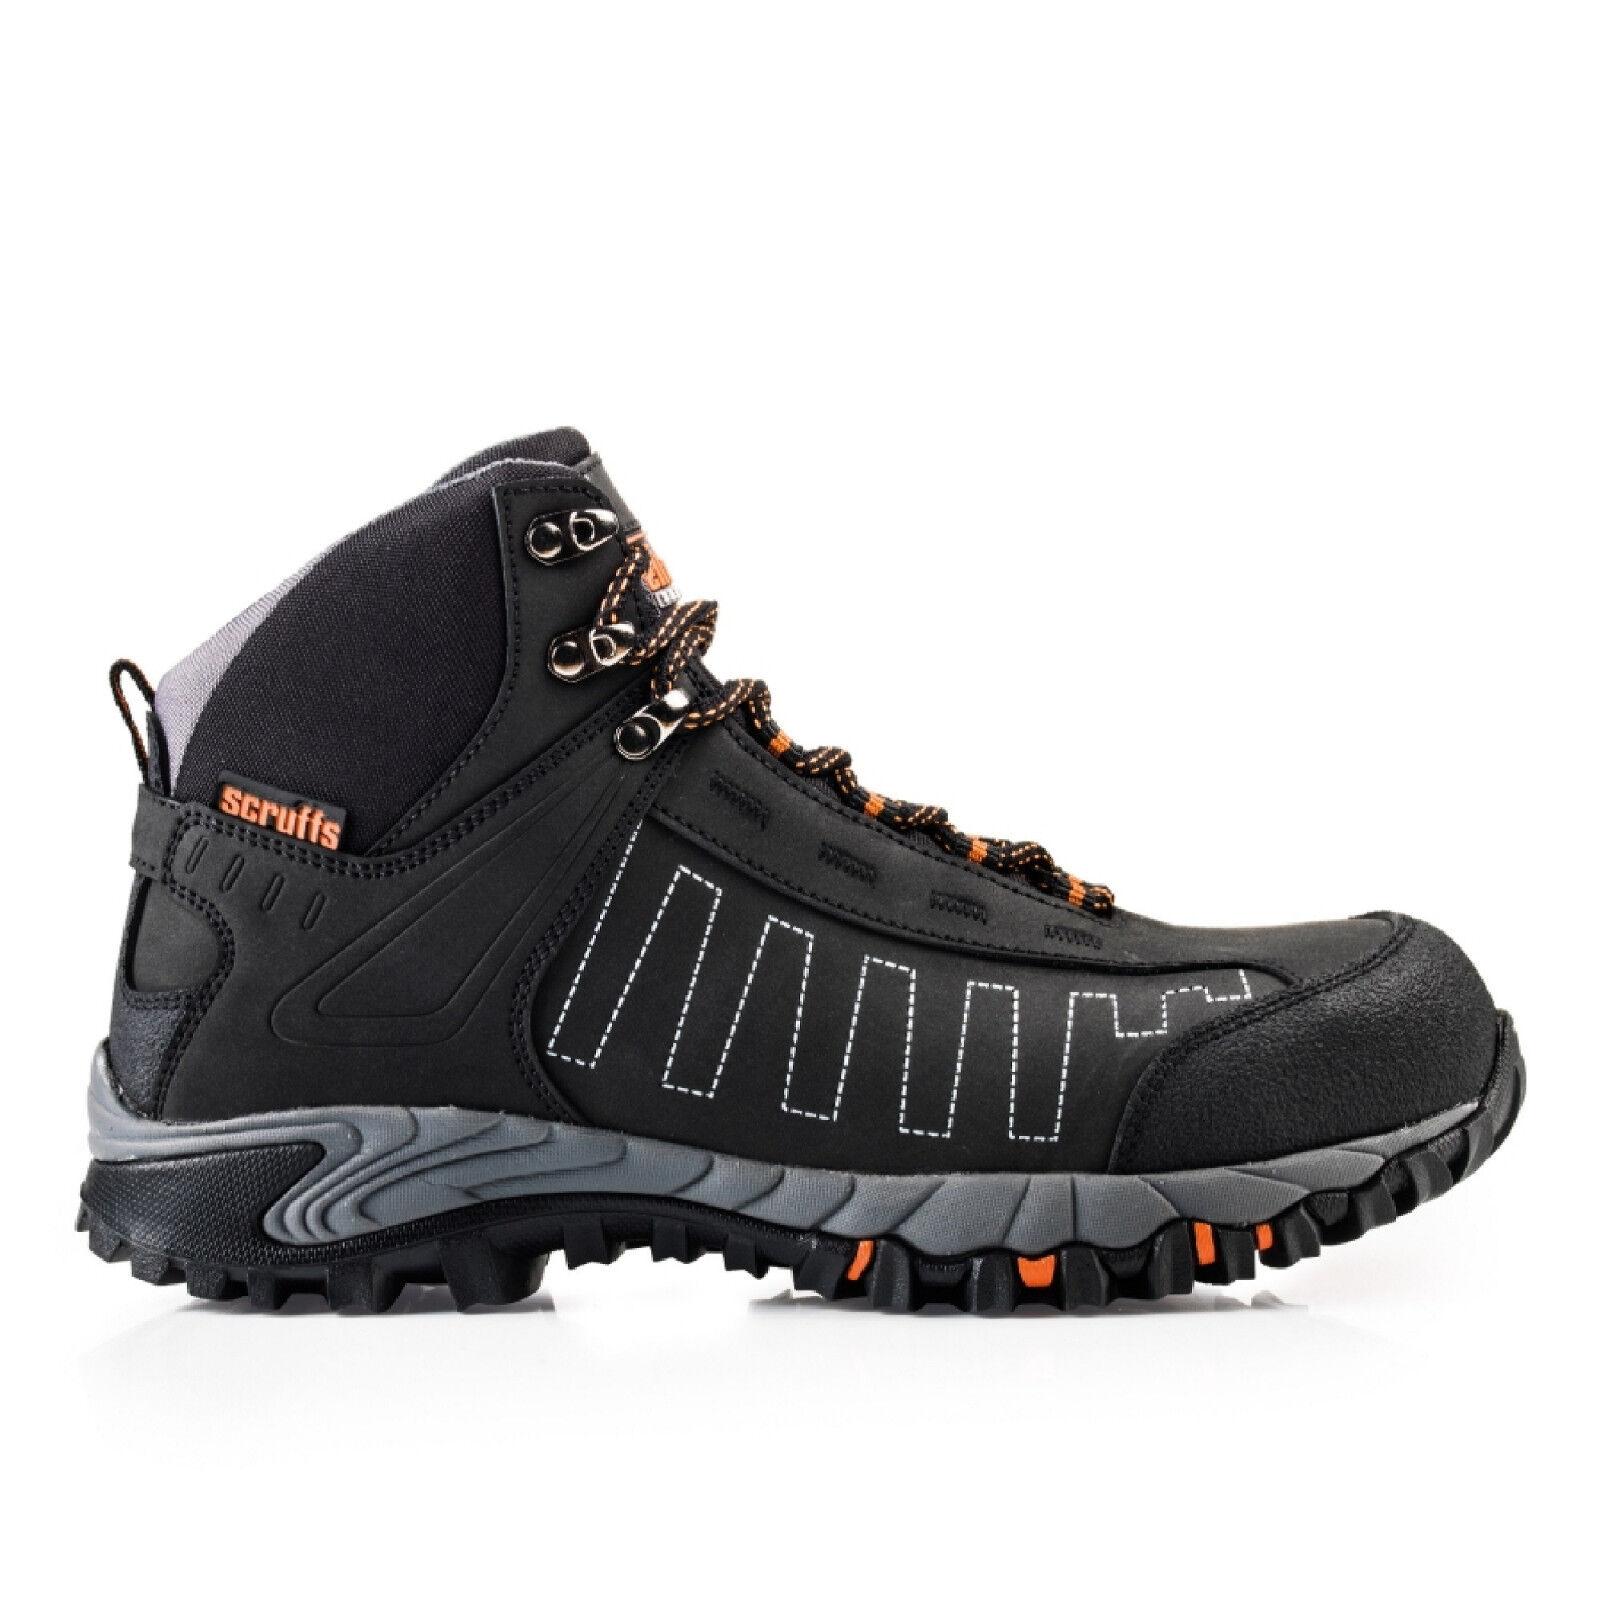 Scruffs Cheviot Seguridad botas   Negro   puntera de aluminio ligero